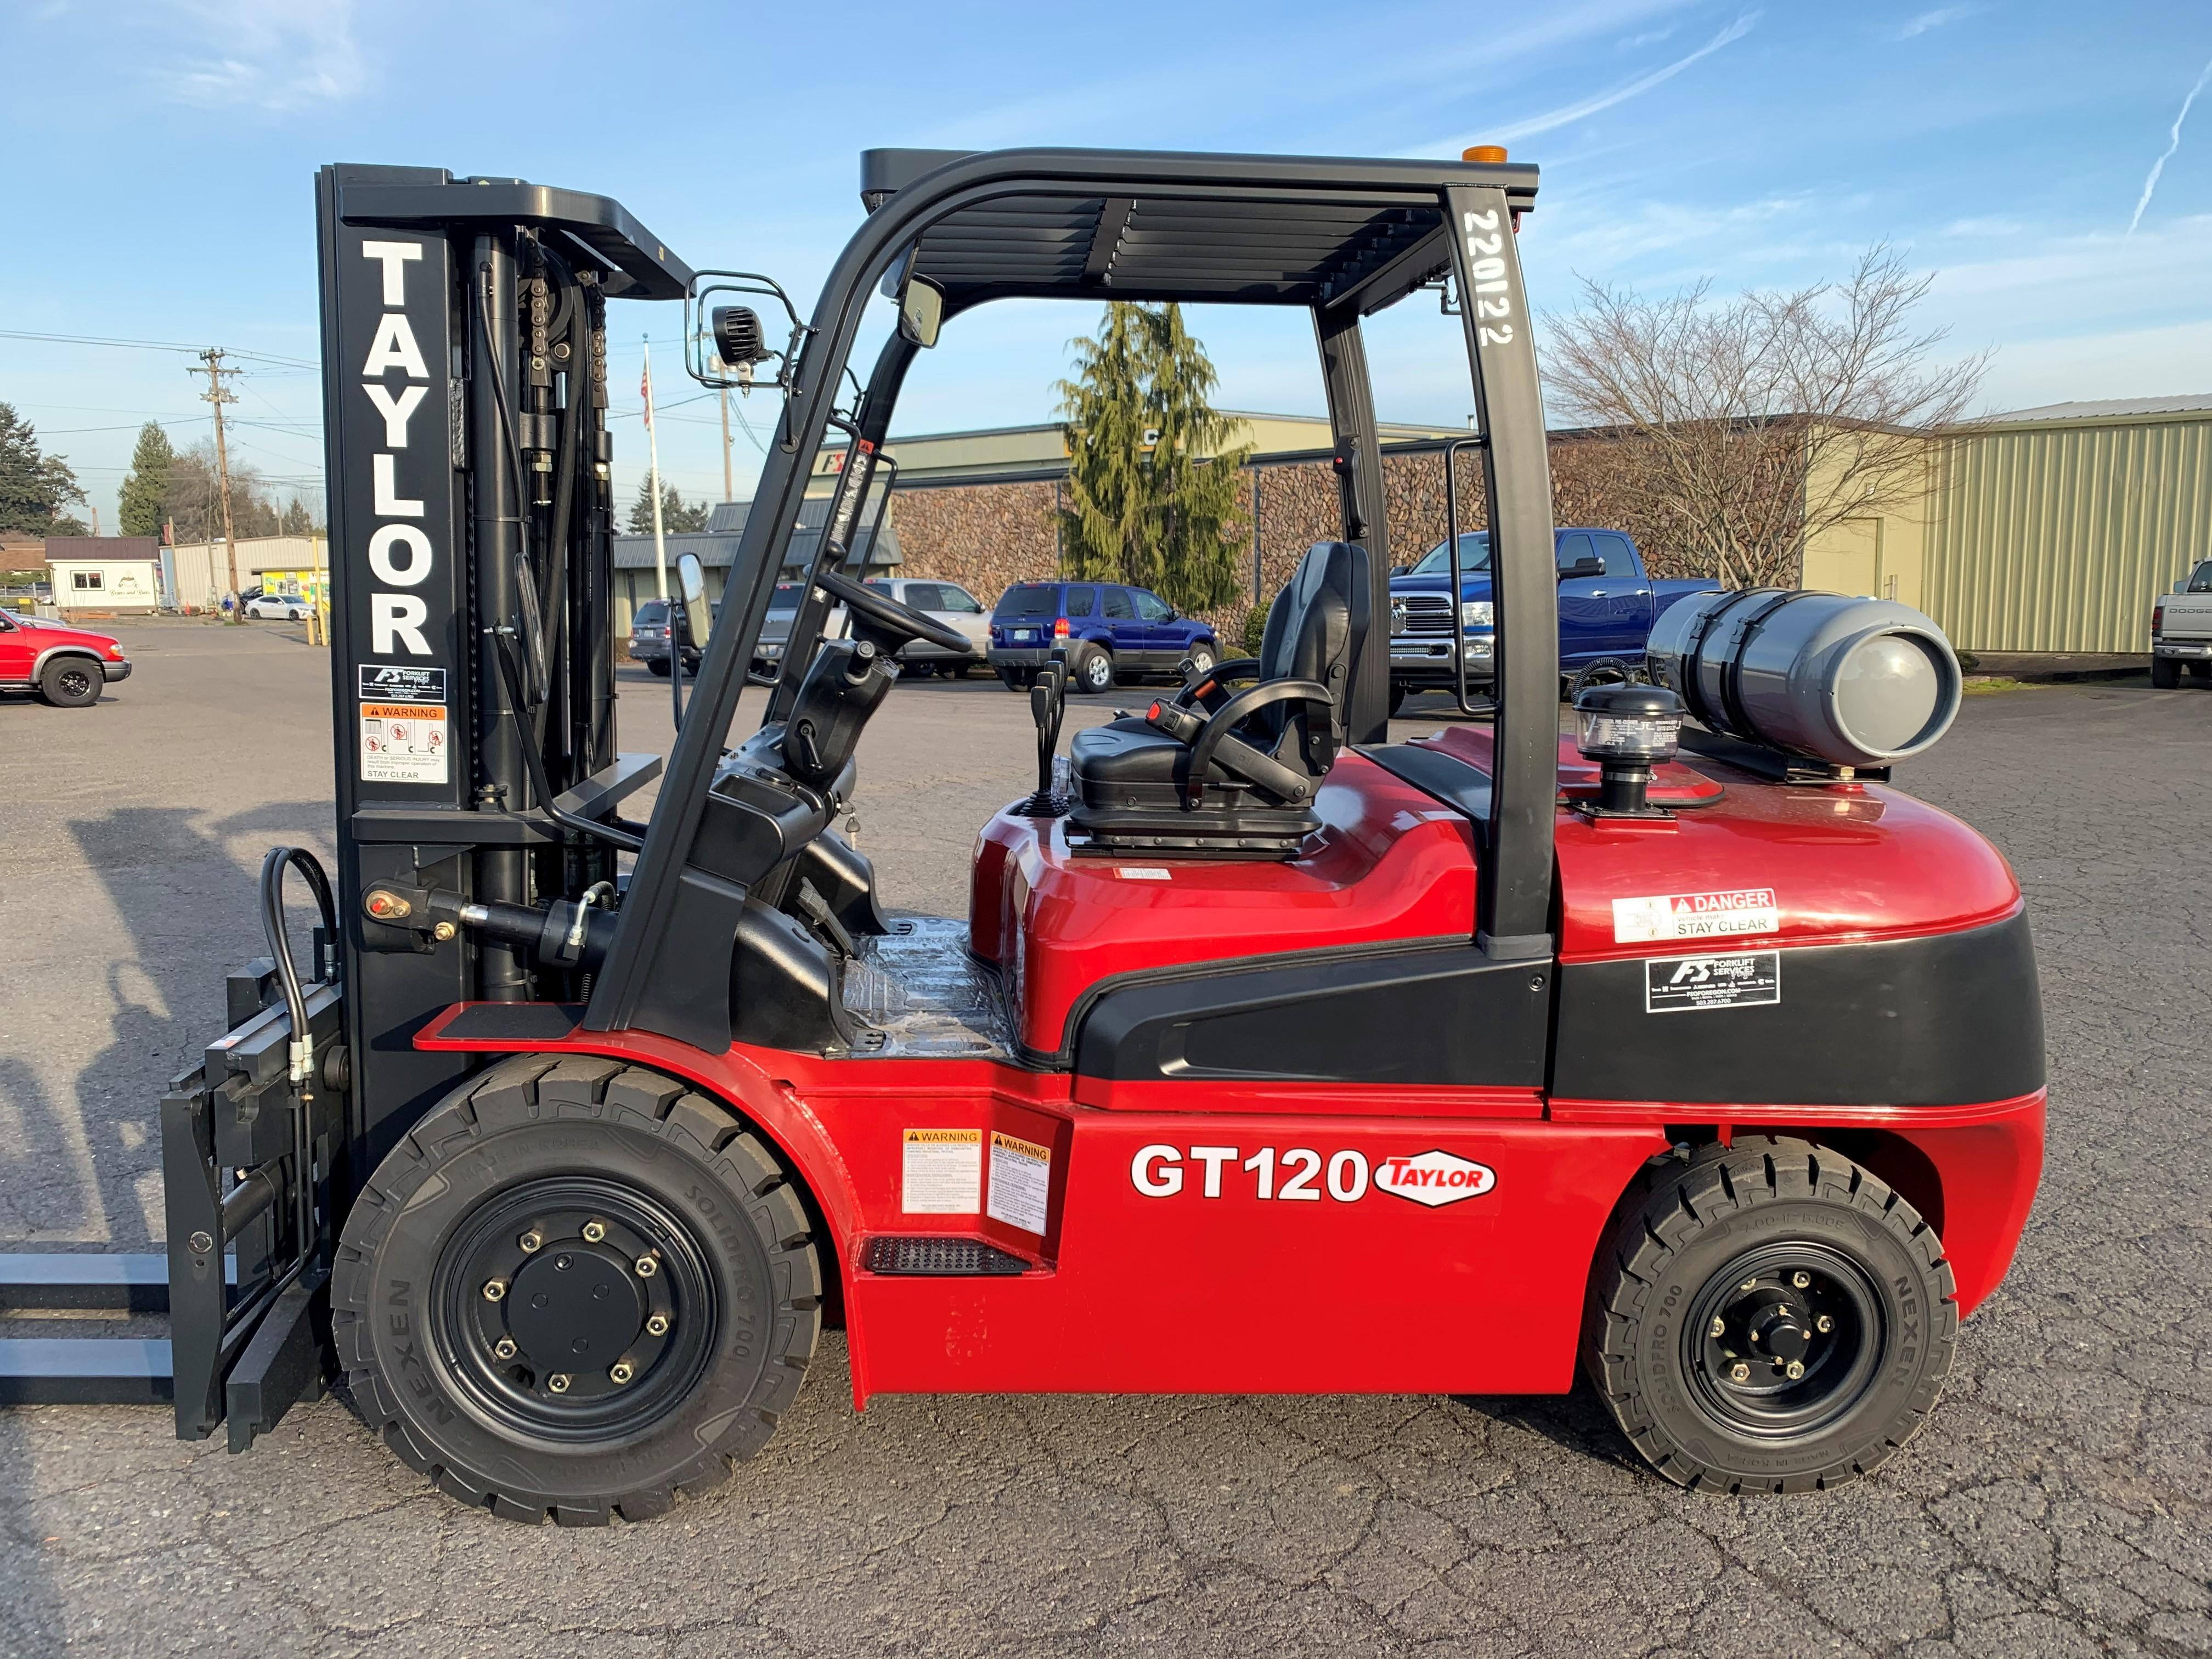 New, 2020, Taylor, GT120  (4 valve), Forklifts / Lift Trucks